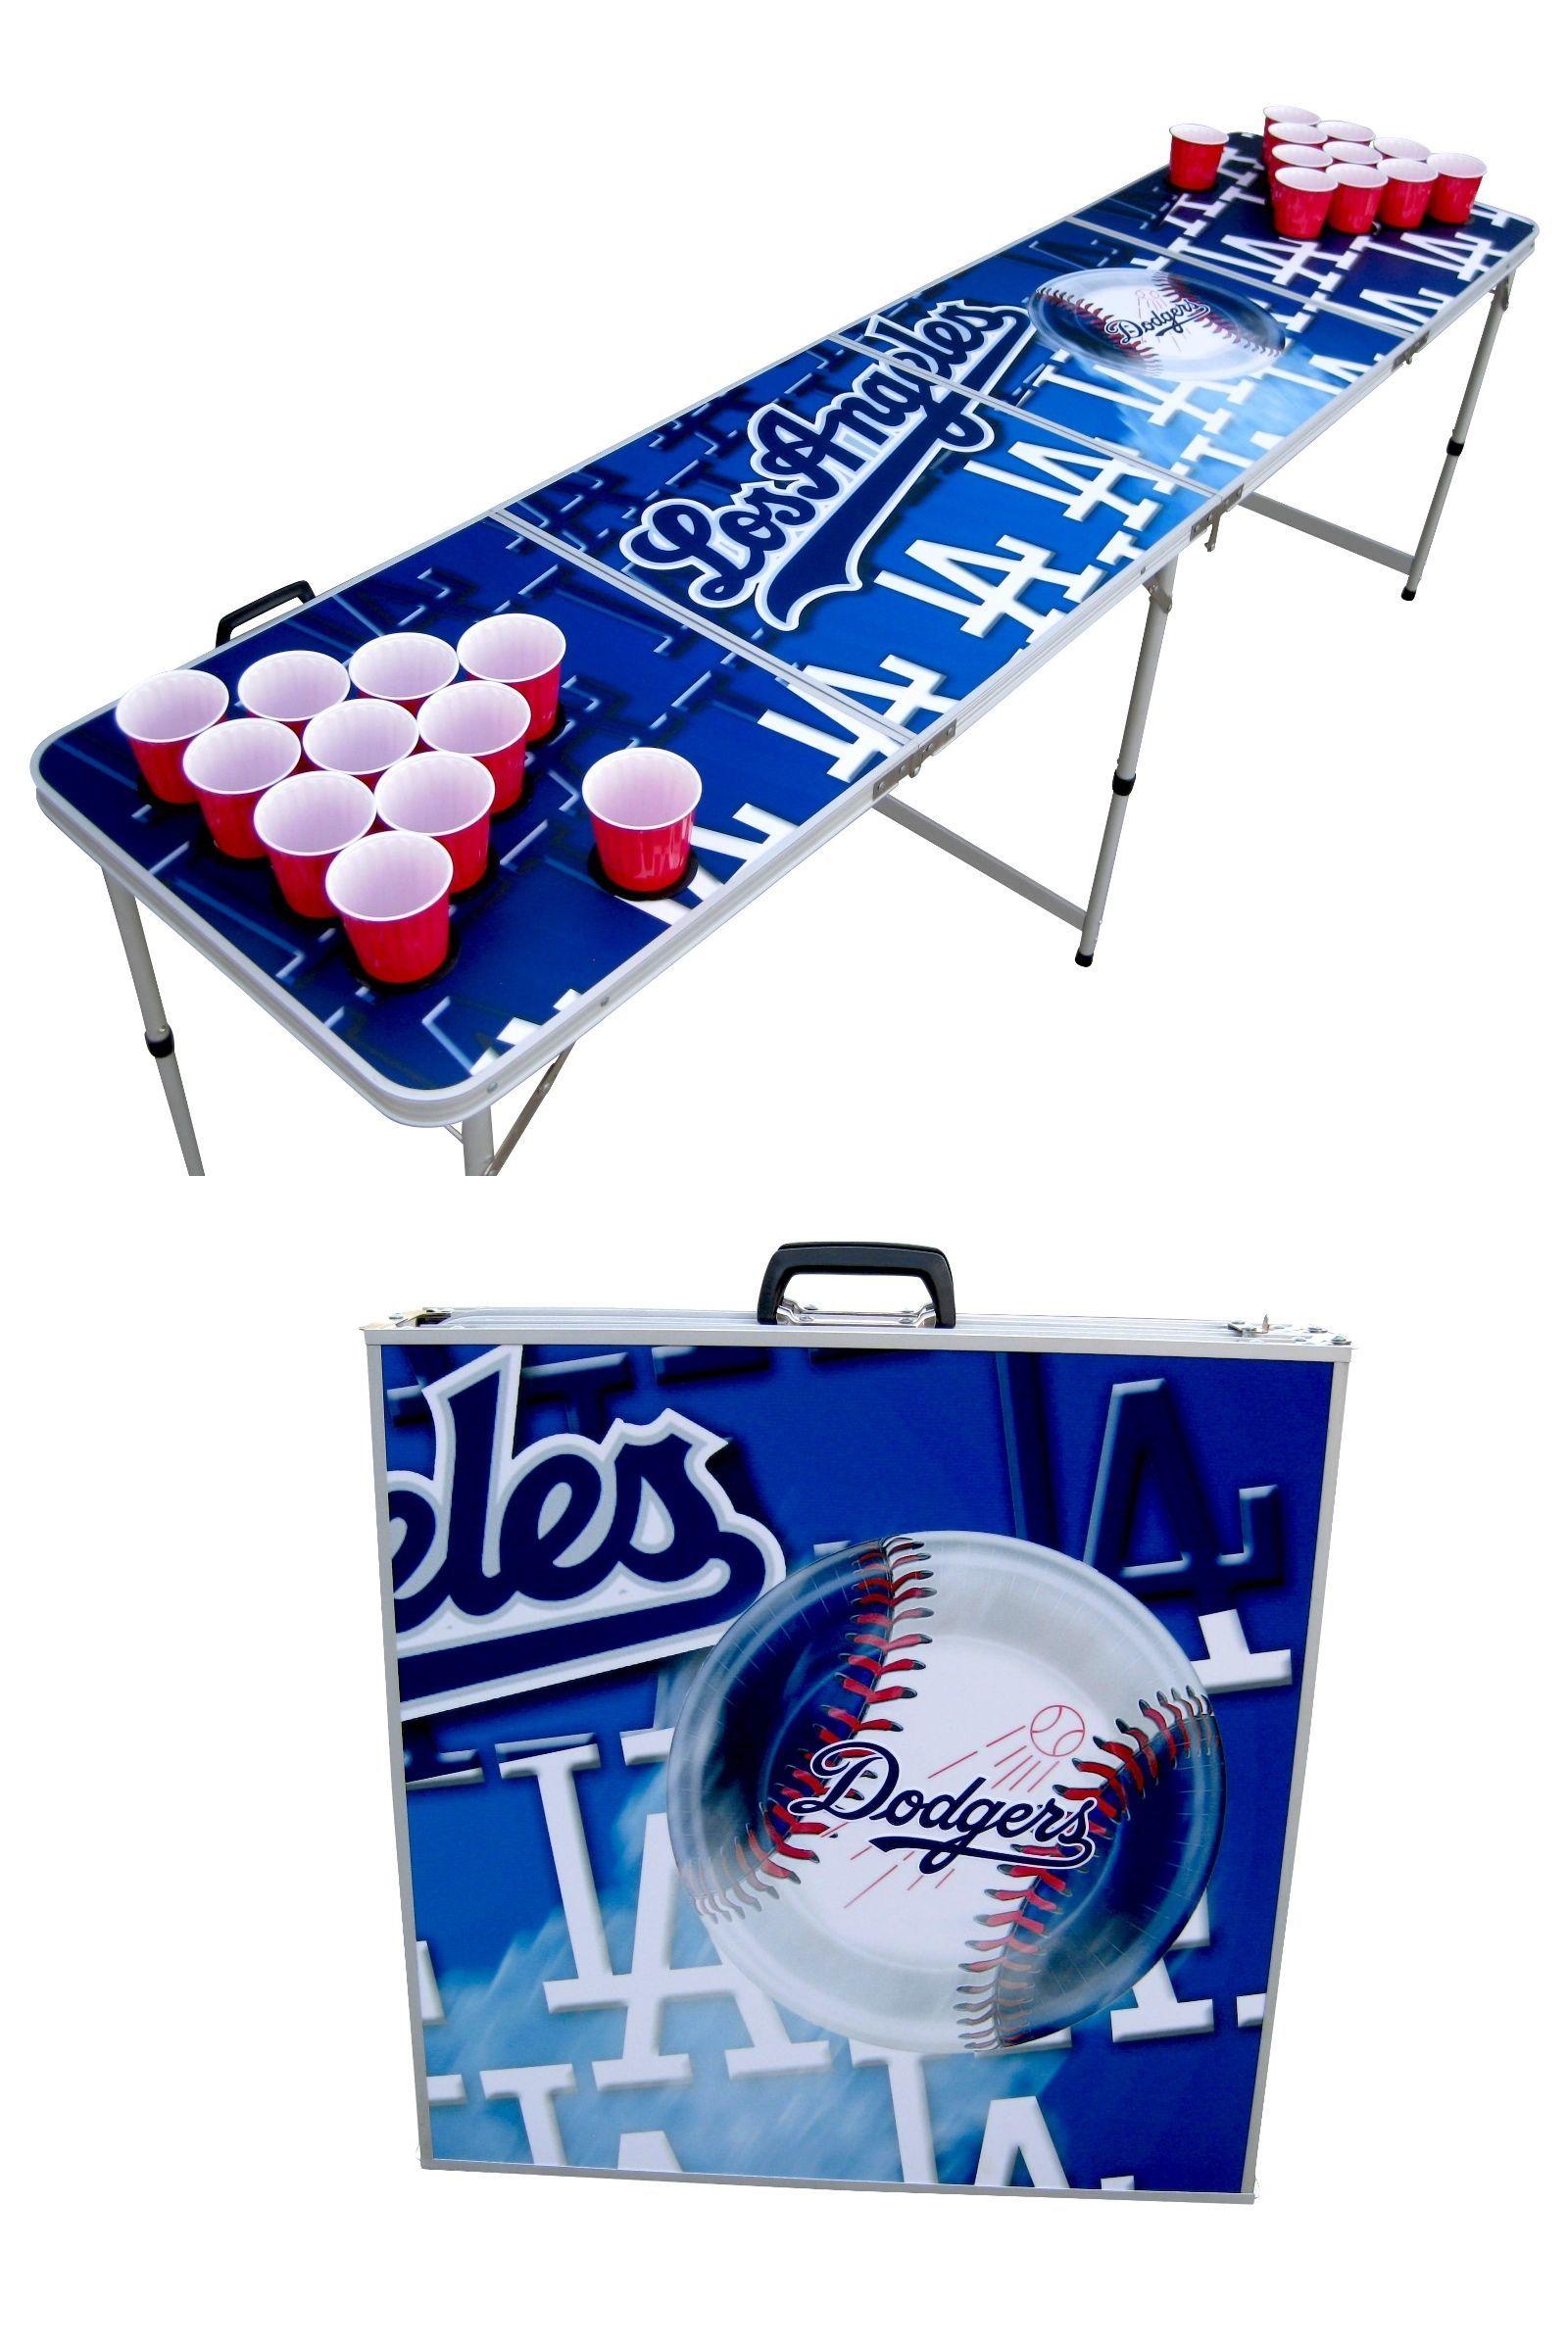 other backyard games 159081 la los angeles dodgers beer pong